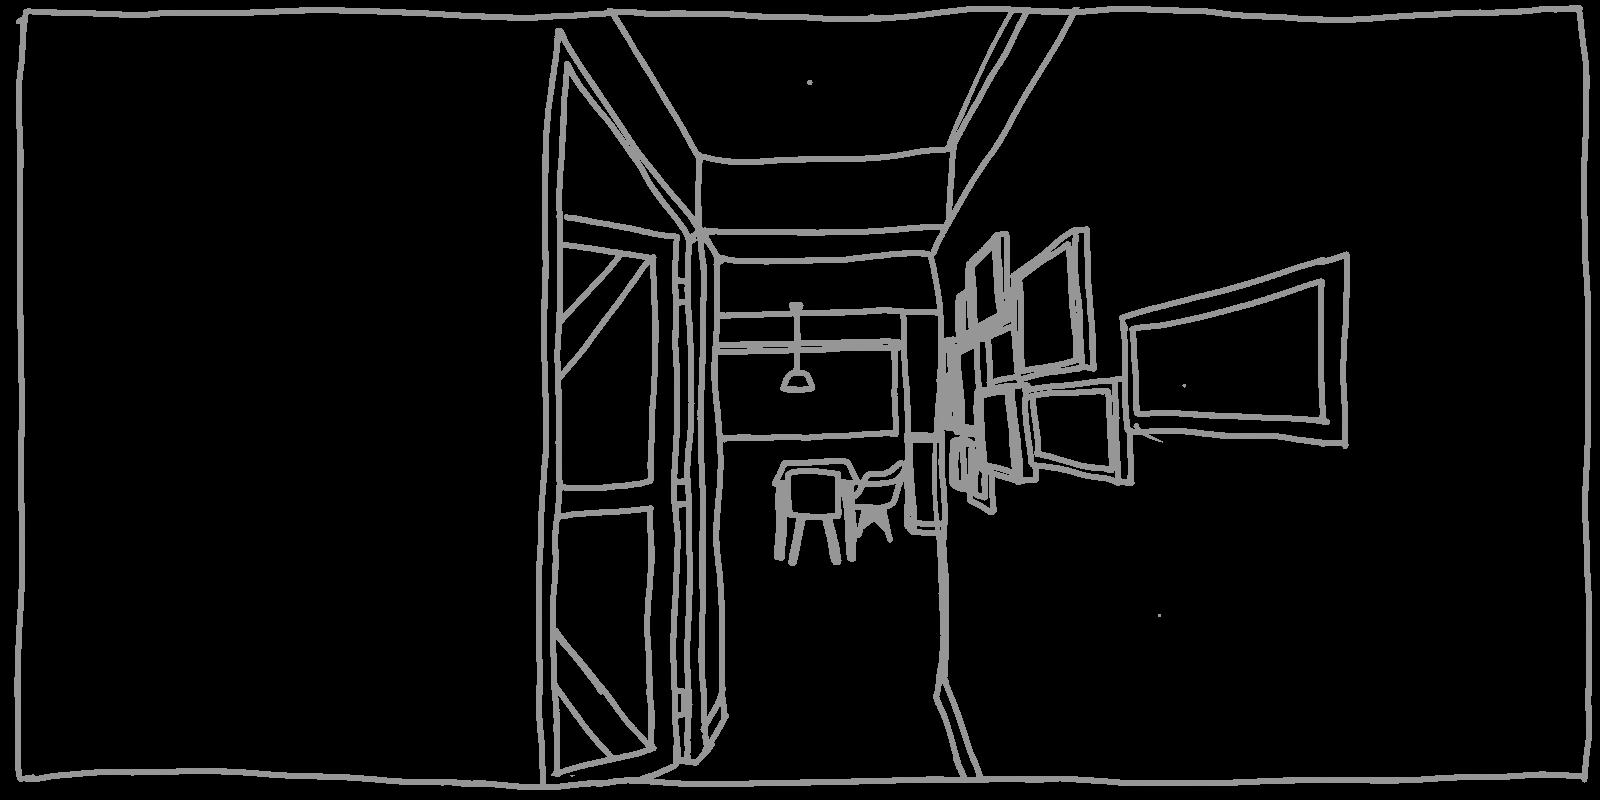 illustration of passageway